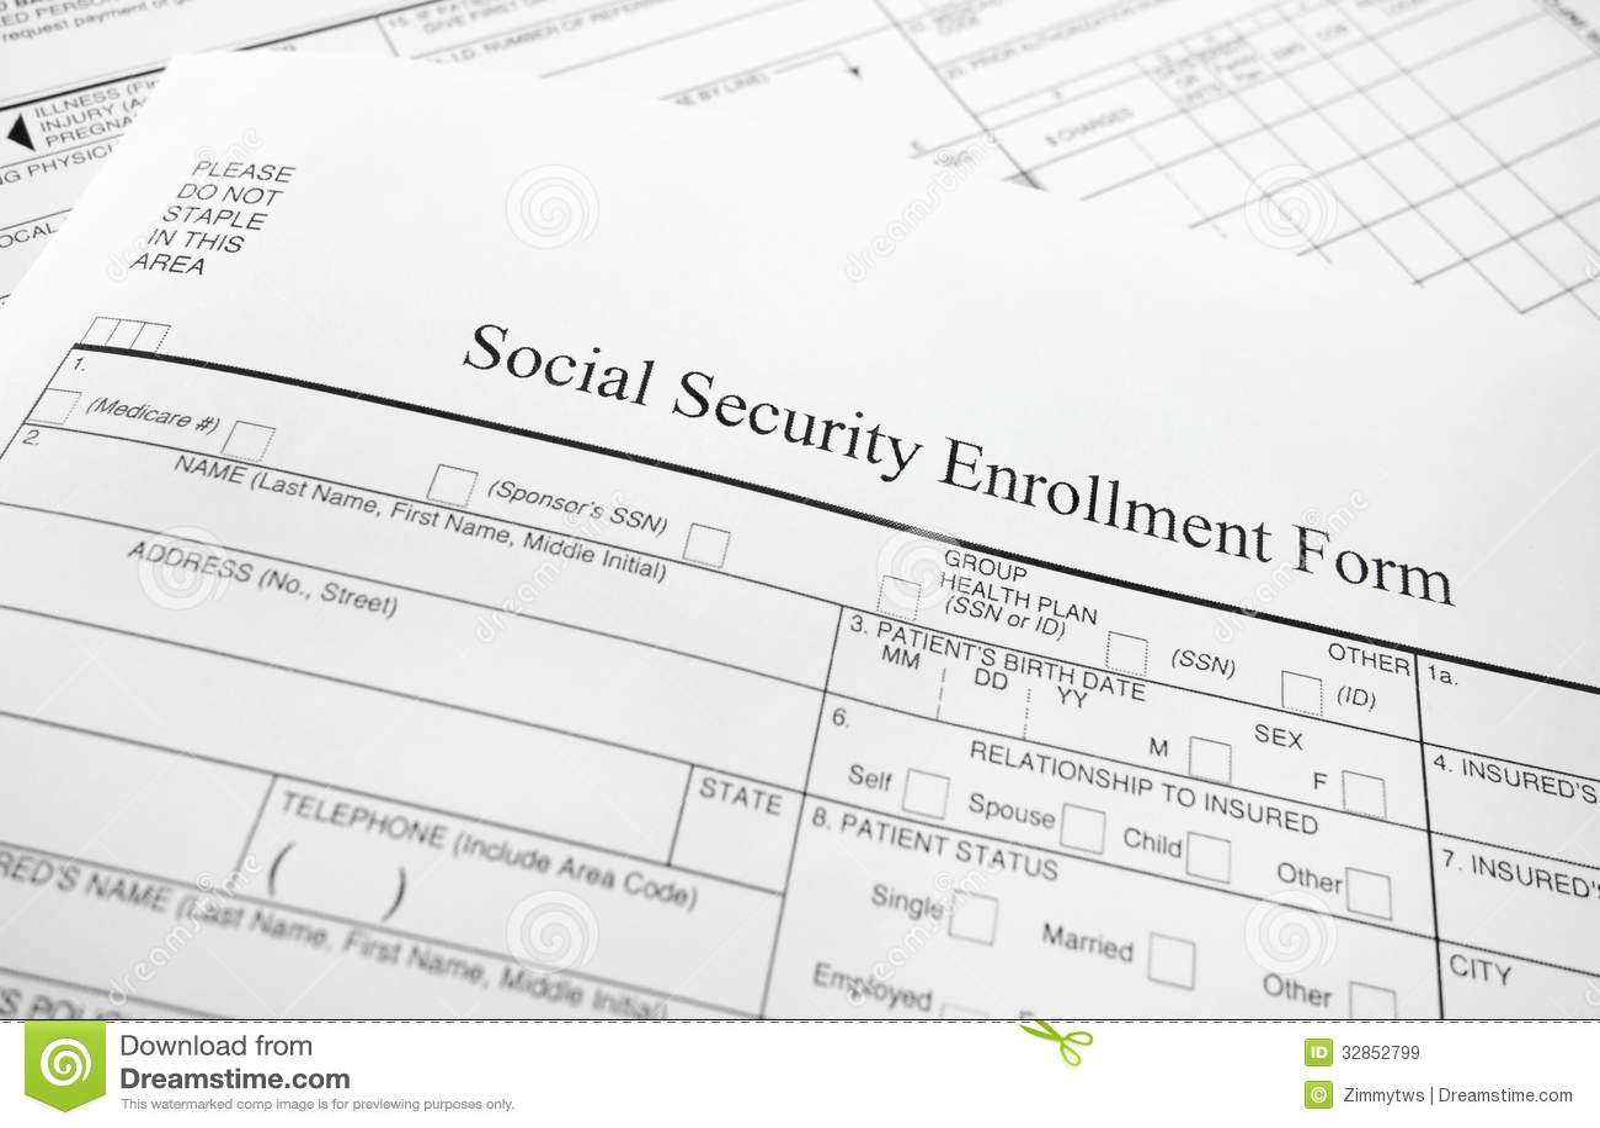 Enrollment Form Royalty Free Stock Images